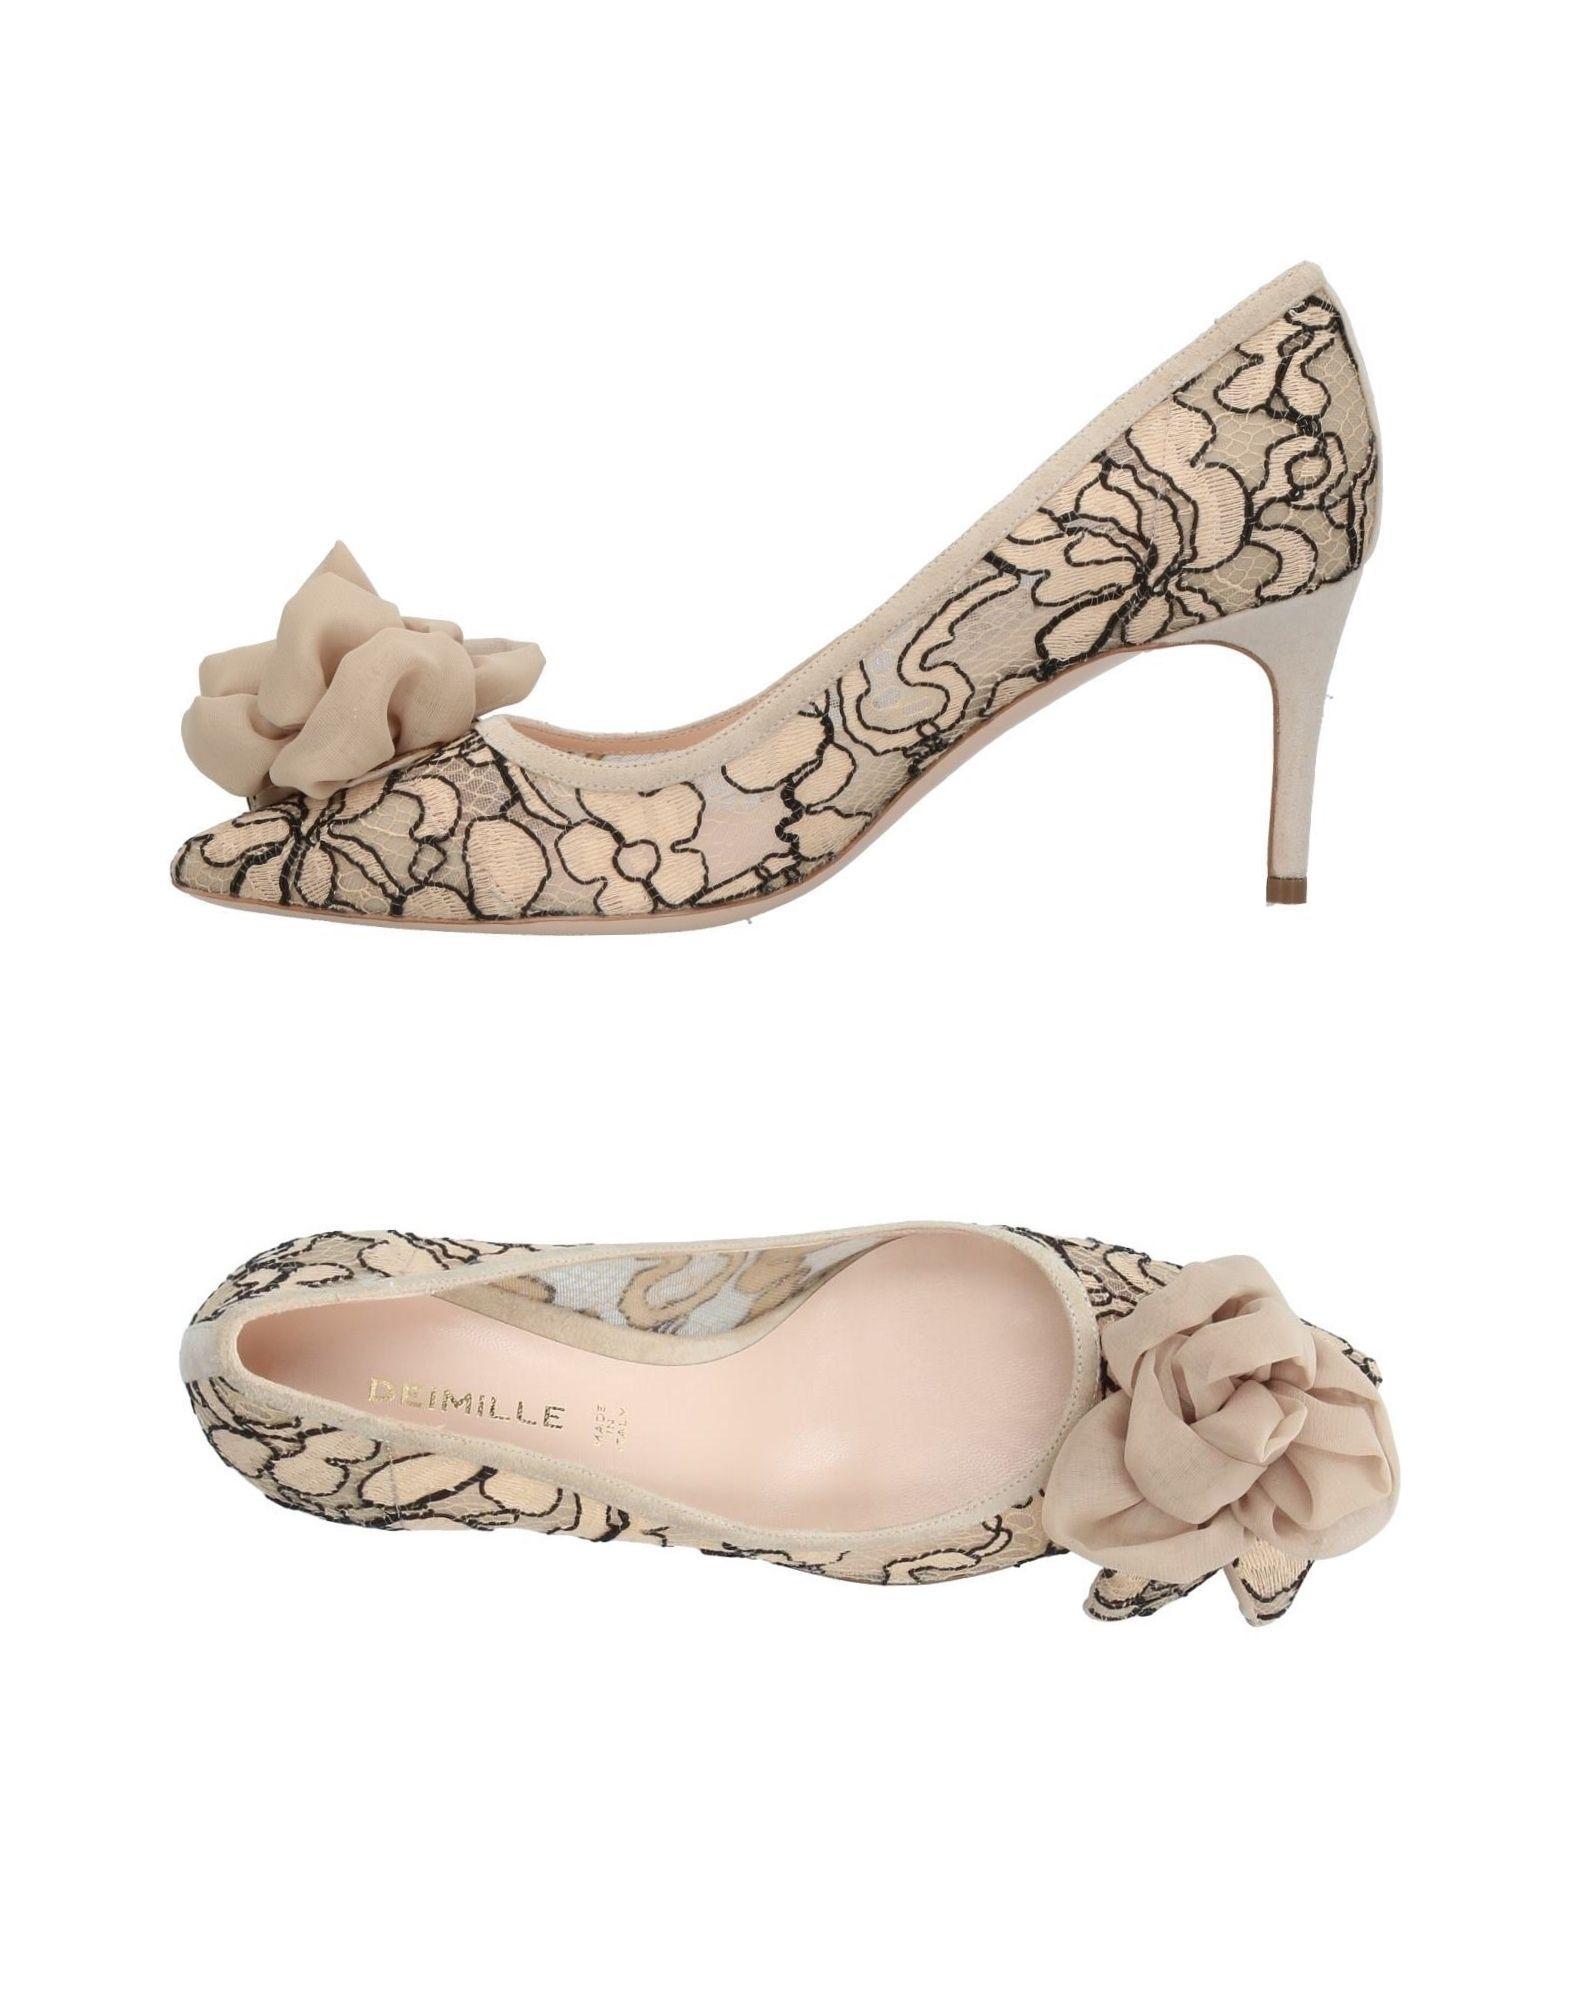 Deimille Pumps Damen  11399601FO Gute Qualität beliebte Schuhe